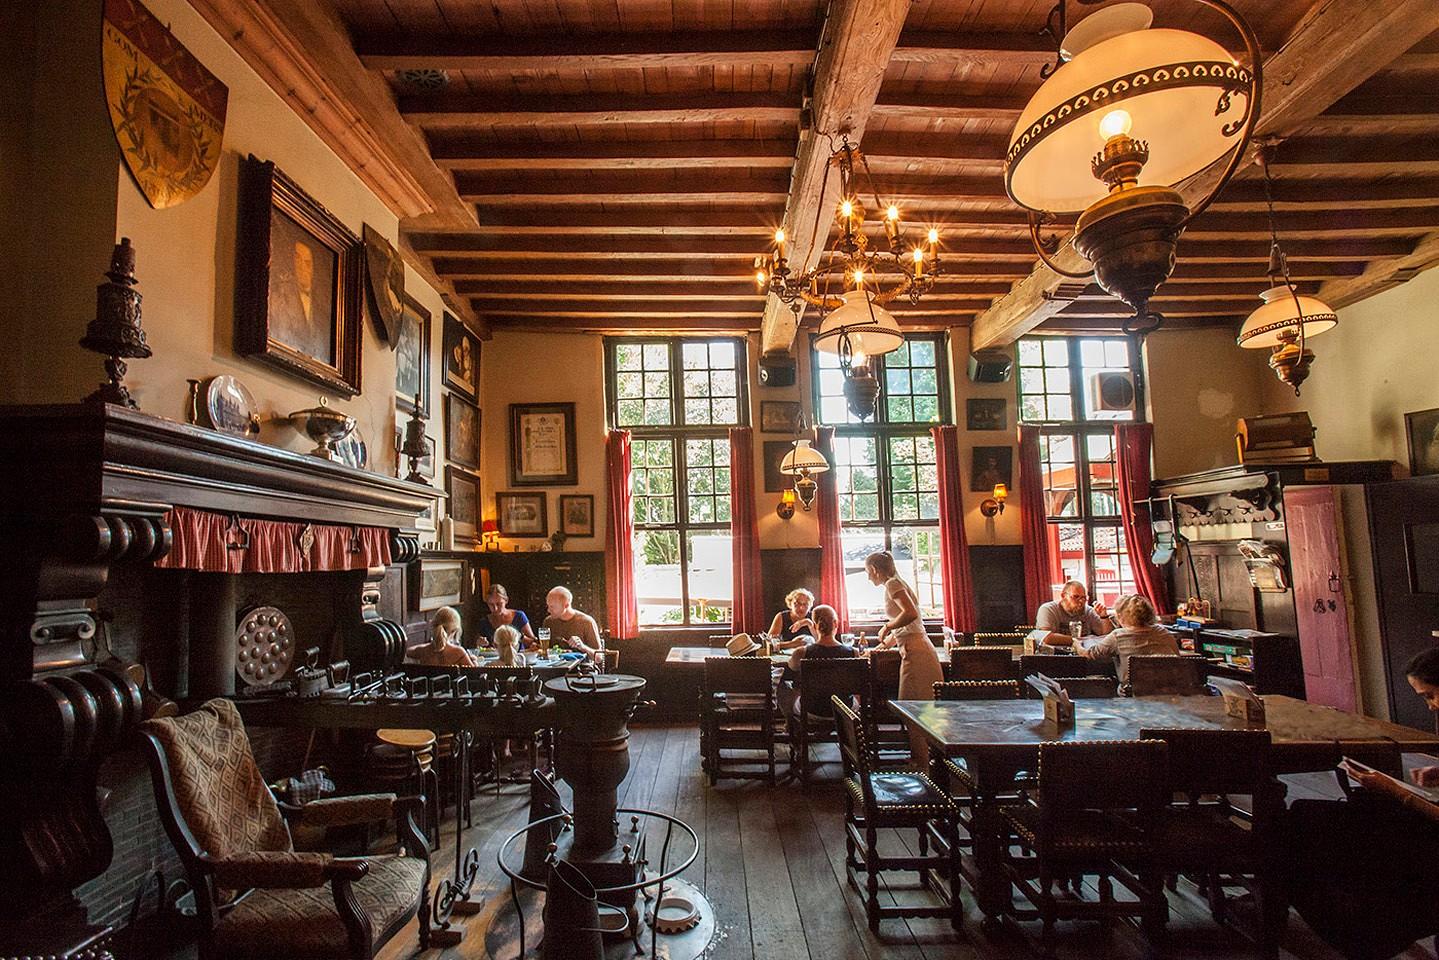 Café VlissingheBruges Belgium